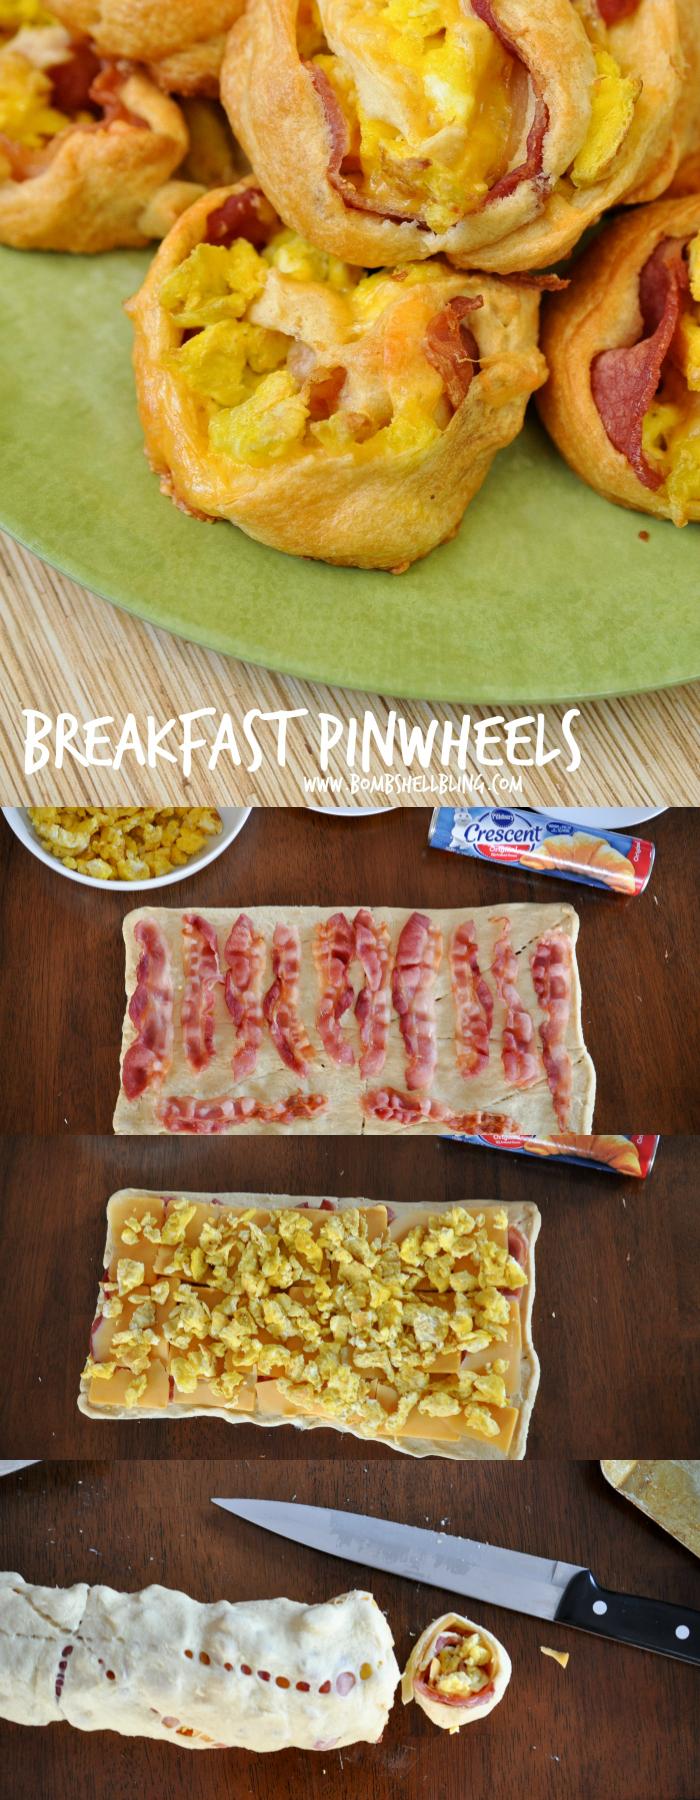 Bacon Egg and Cheese Pinwheels